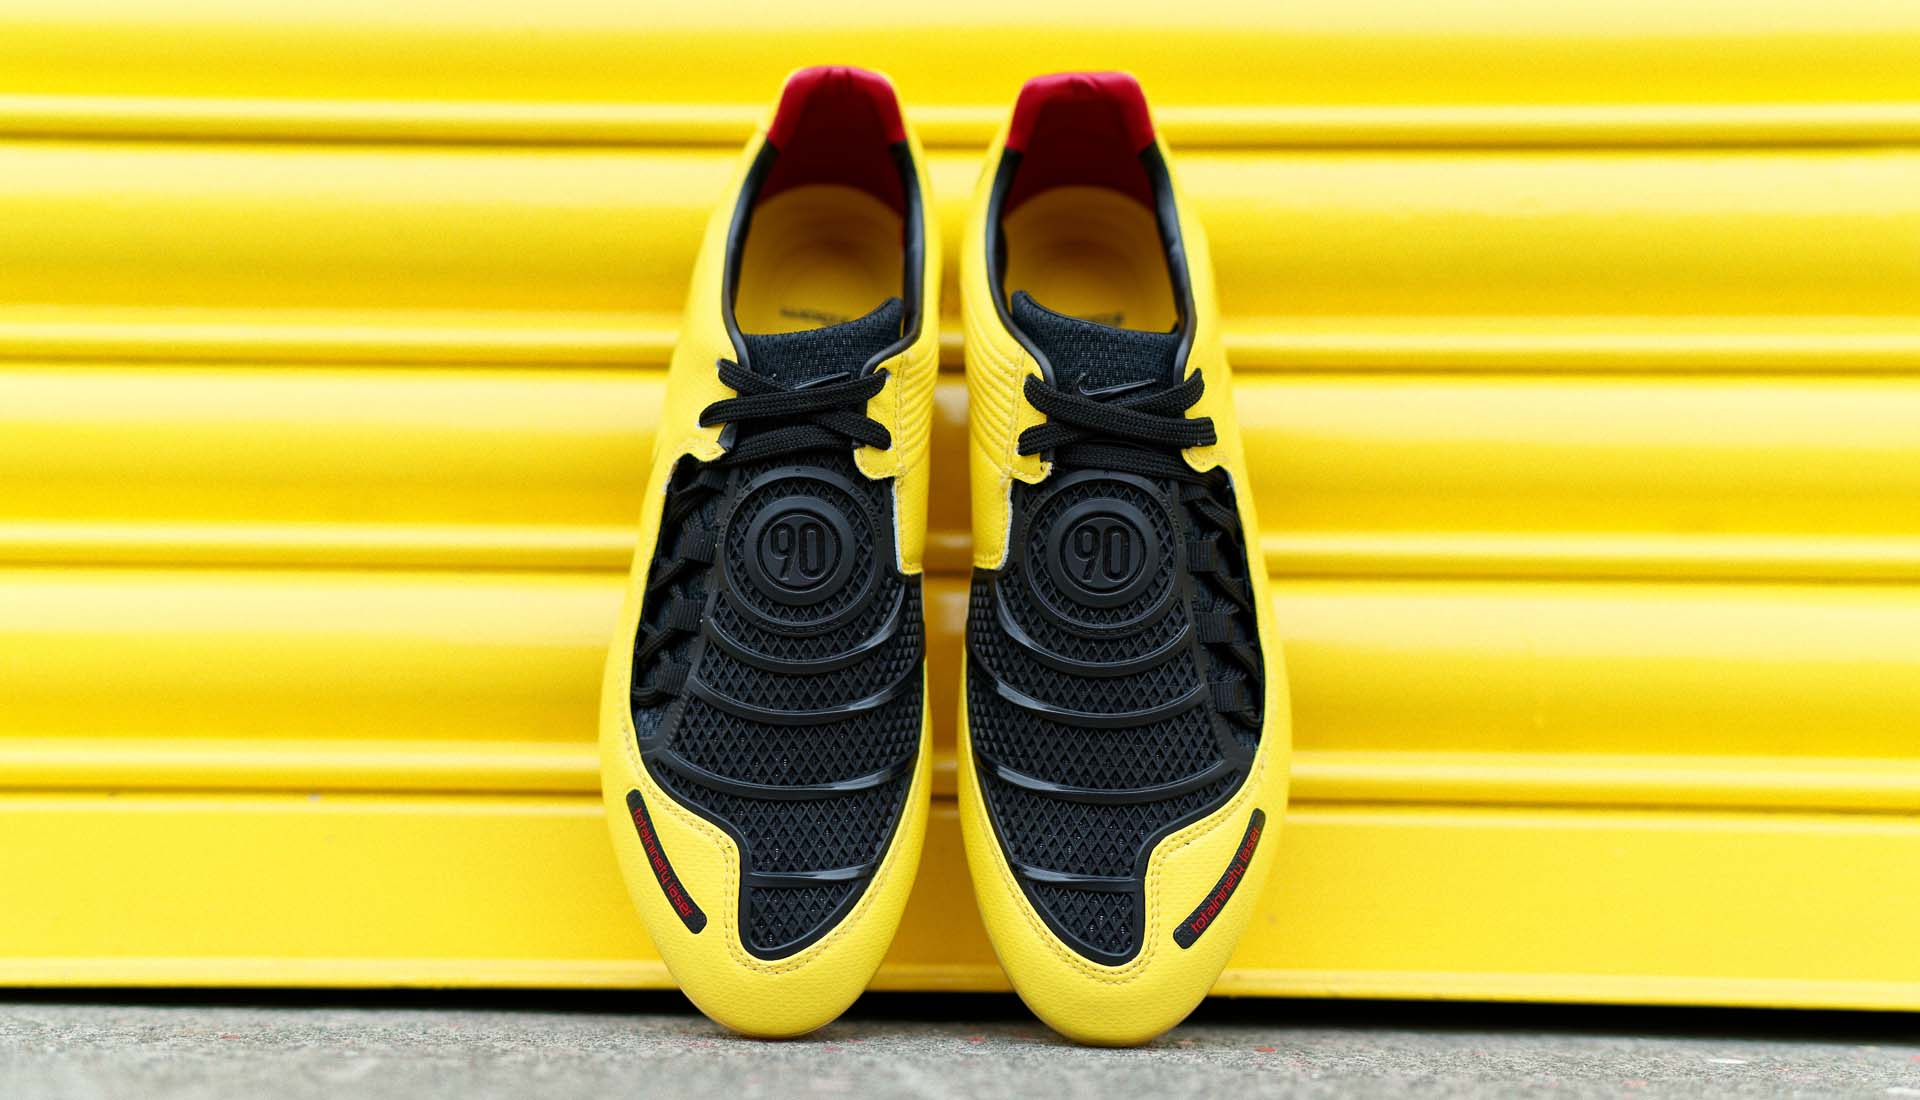 Giay da bong Nike T90 vang den